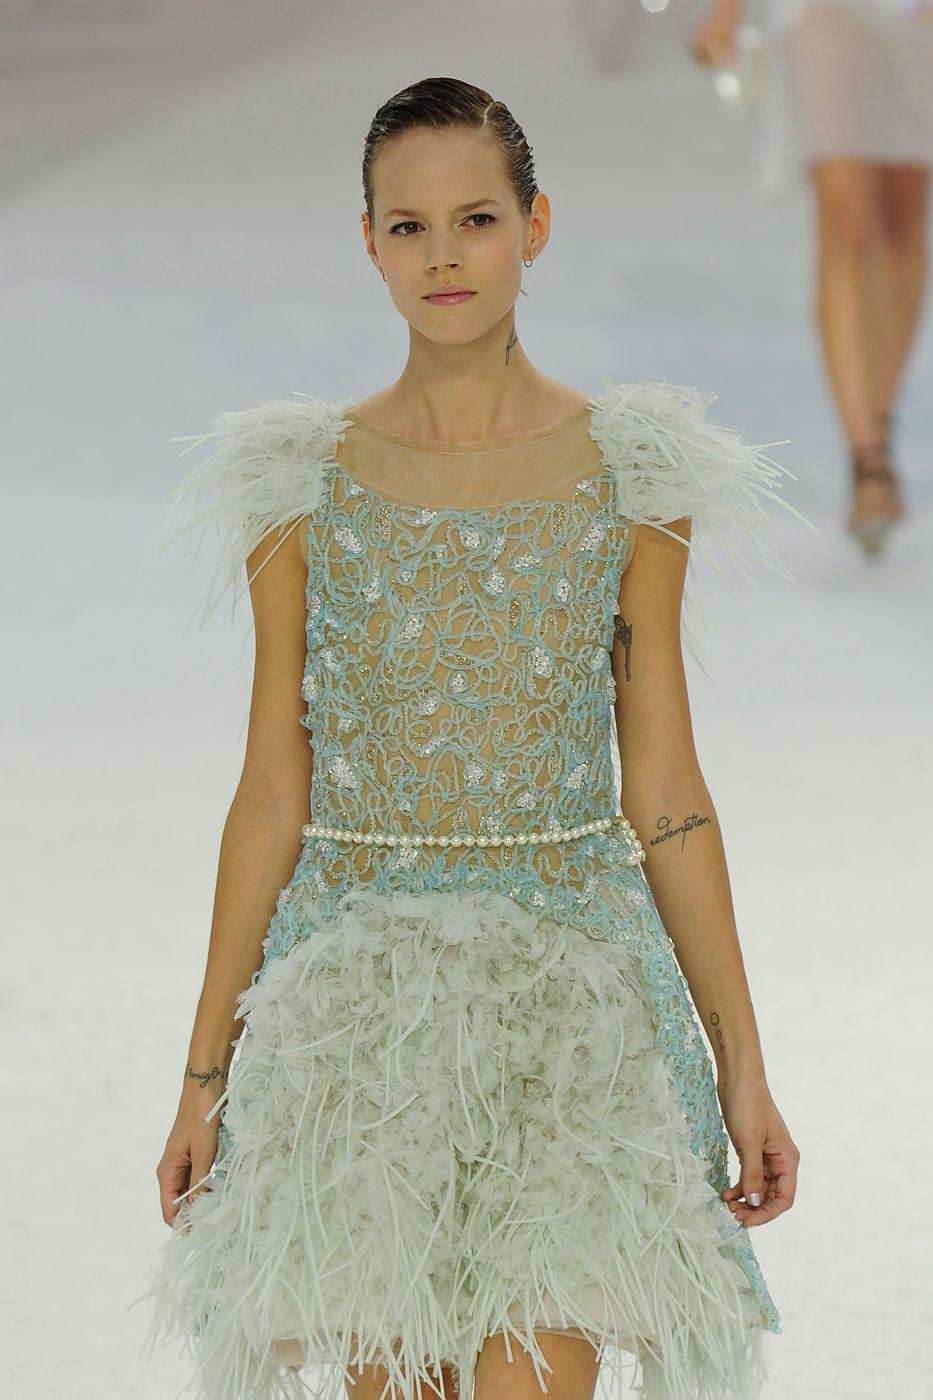 Chanel Spring 2012 bv 3 l 1 cpa P Sx